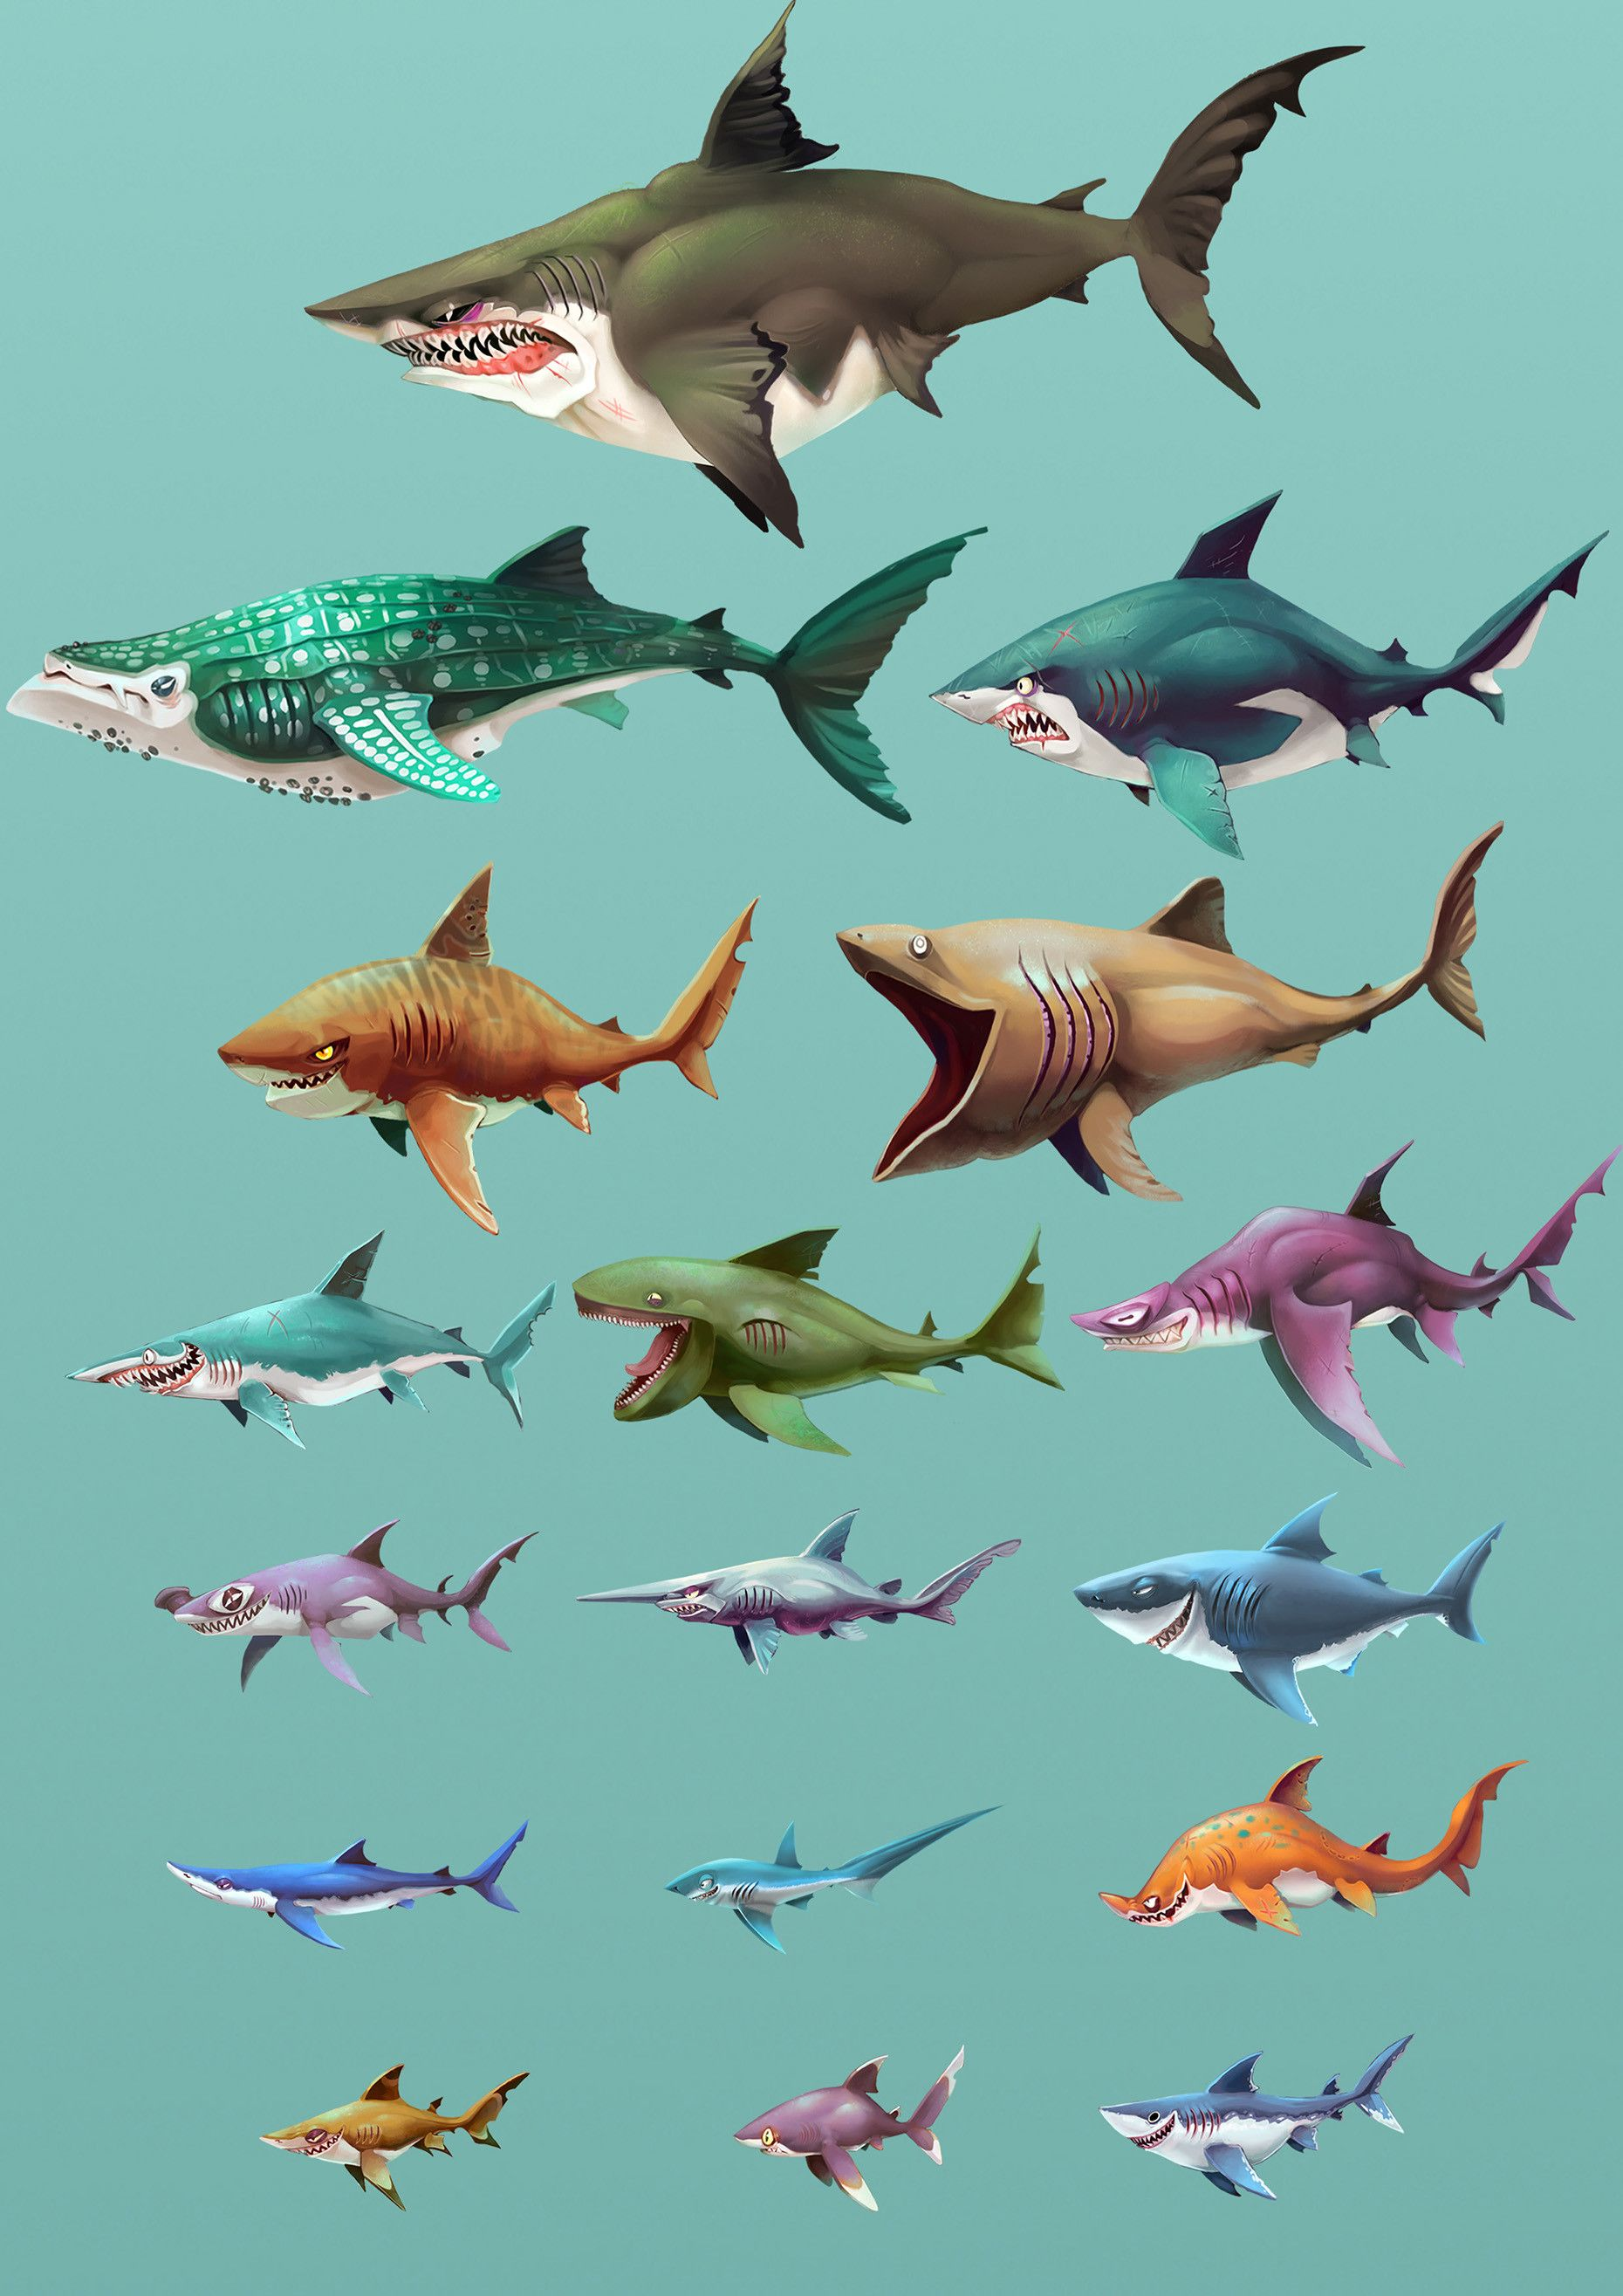 ArtStation - Hungry Shark World - Playable Character Concepts, Johanna  Cranston | Shark illustration, Shark art, Shark